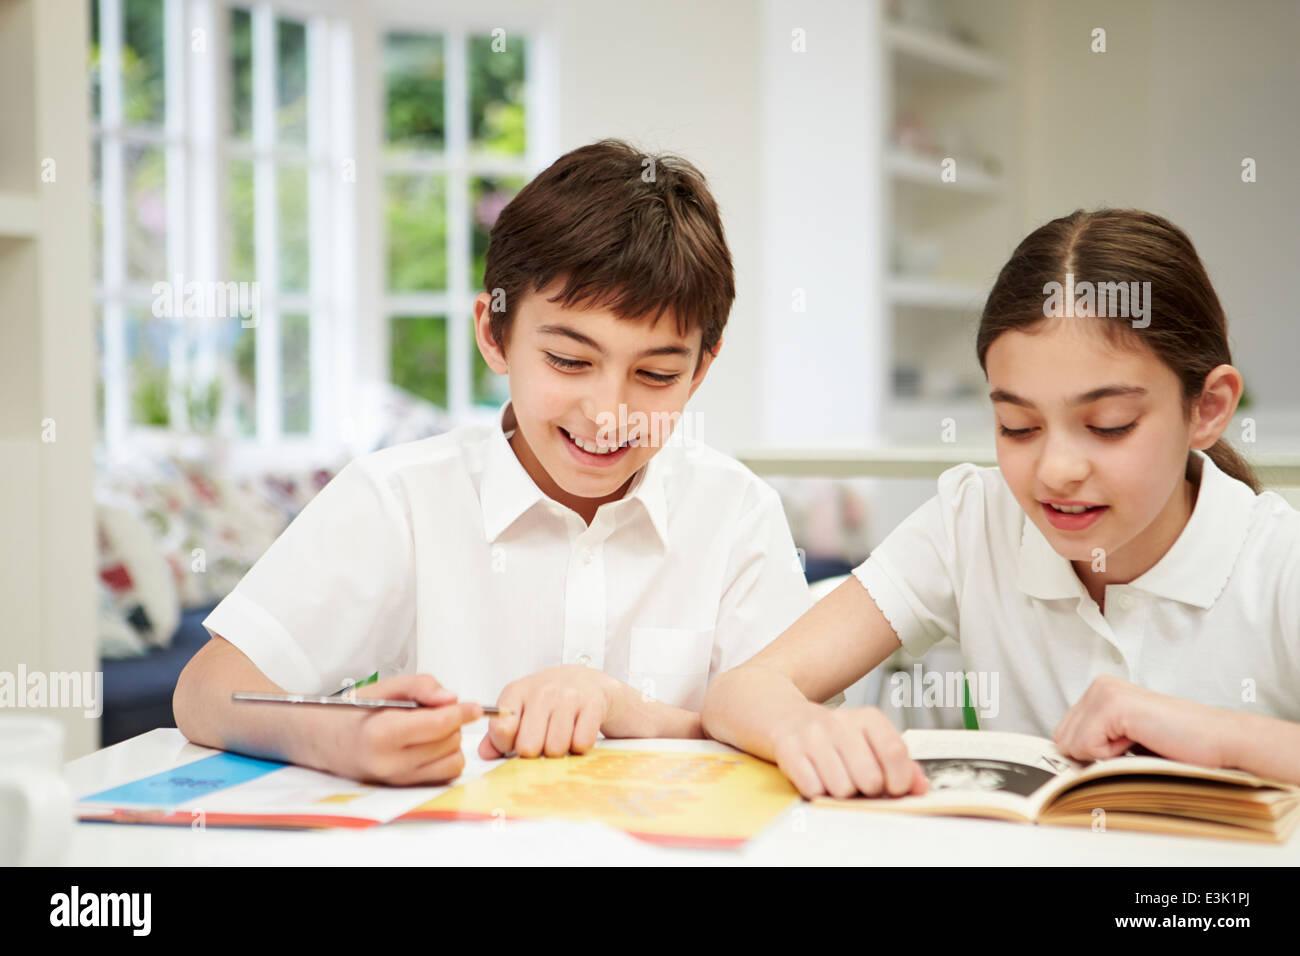 Children Wearing School Uniform Doing Homework In Kitchen Stock ...